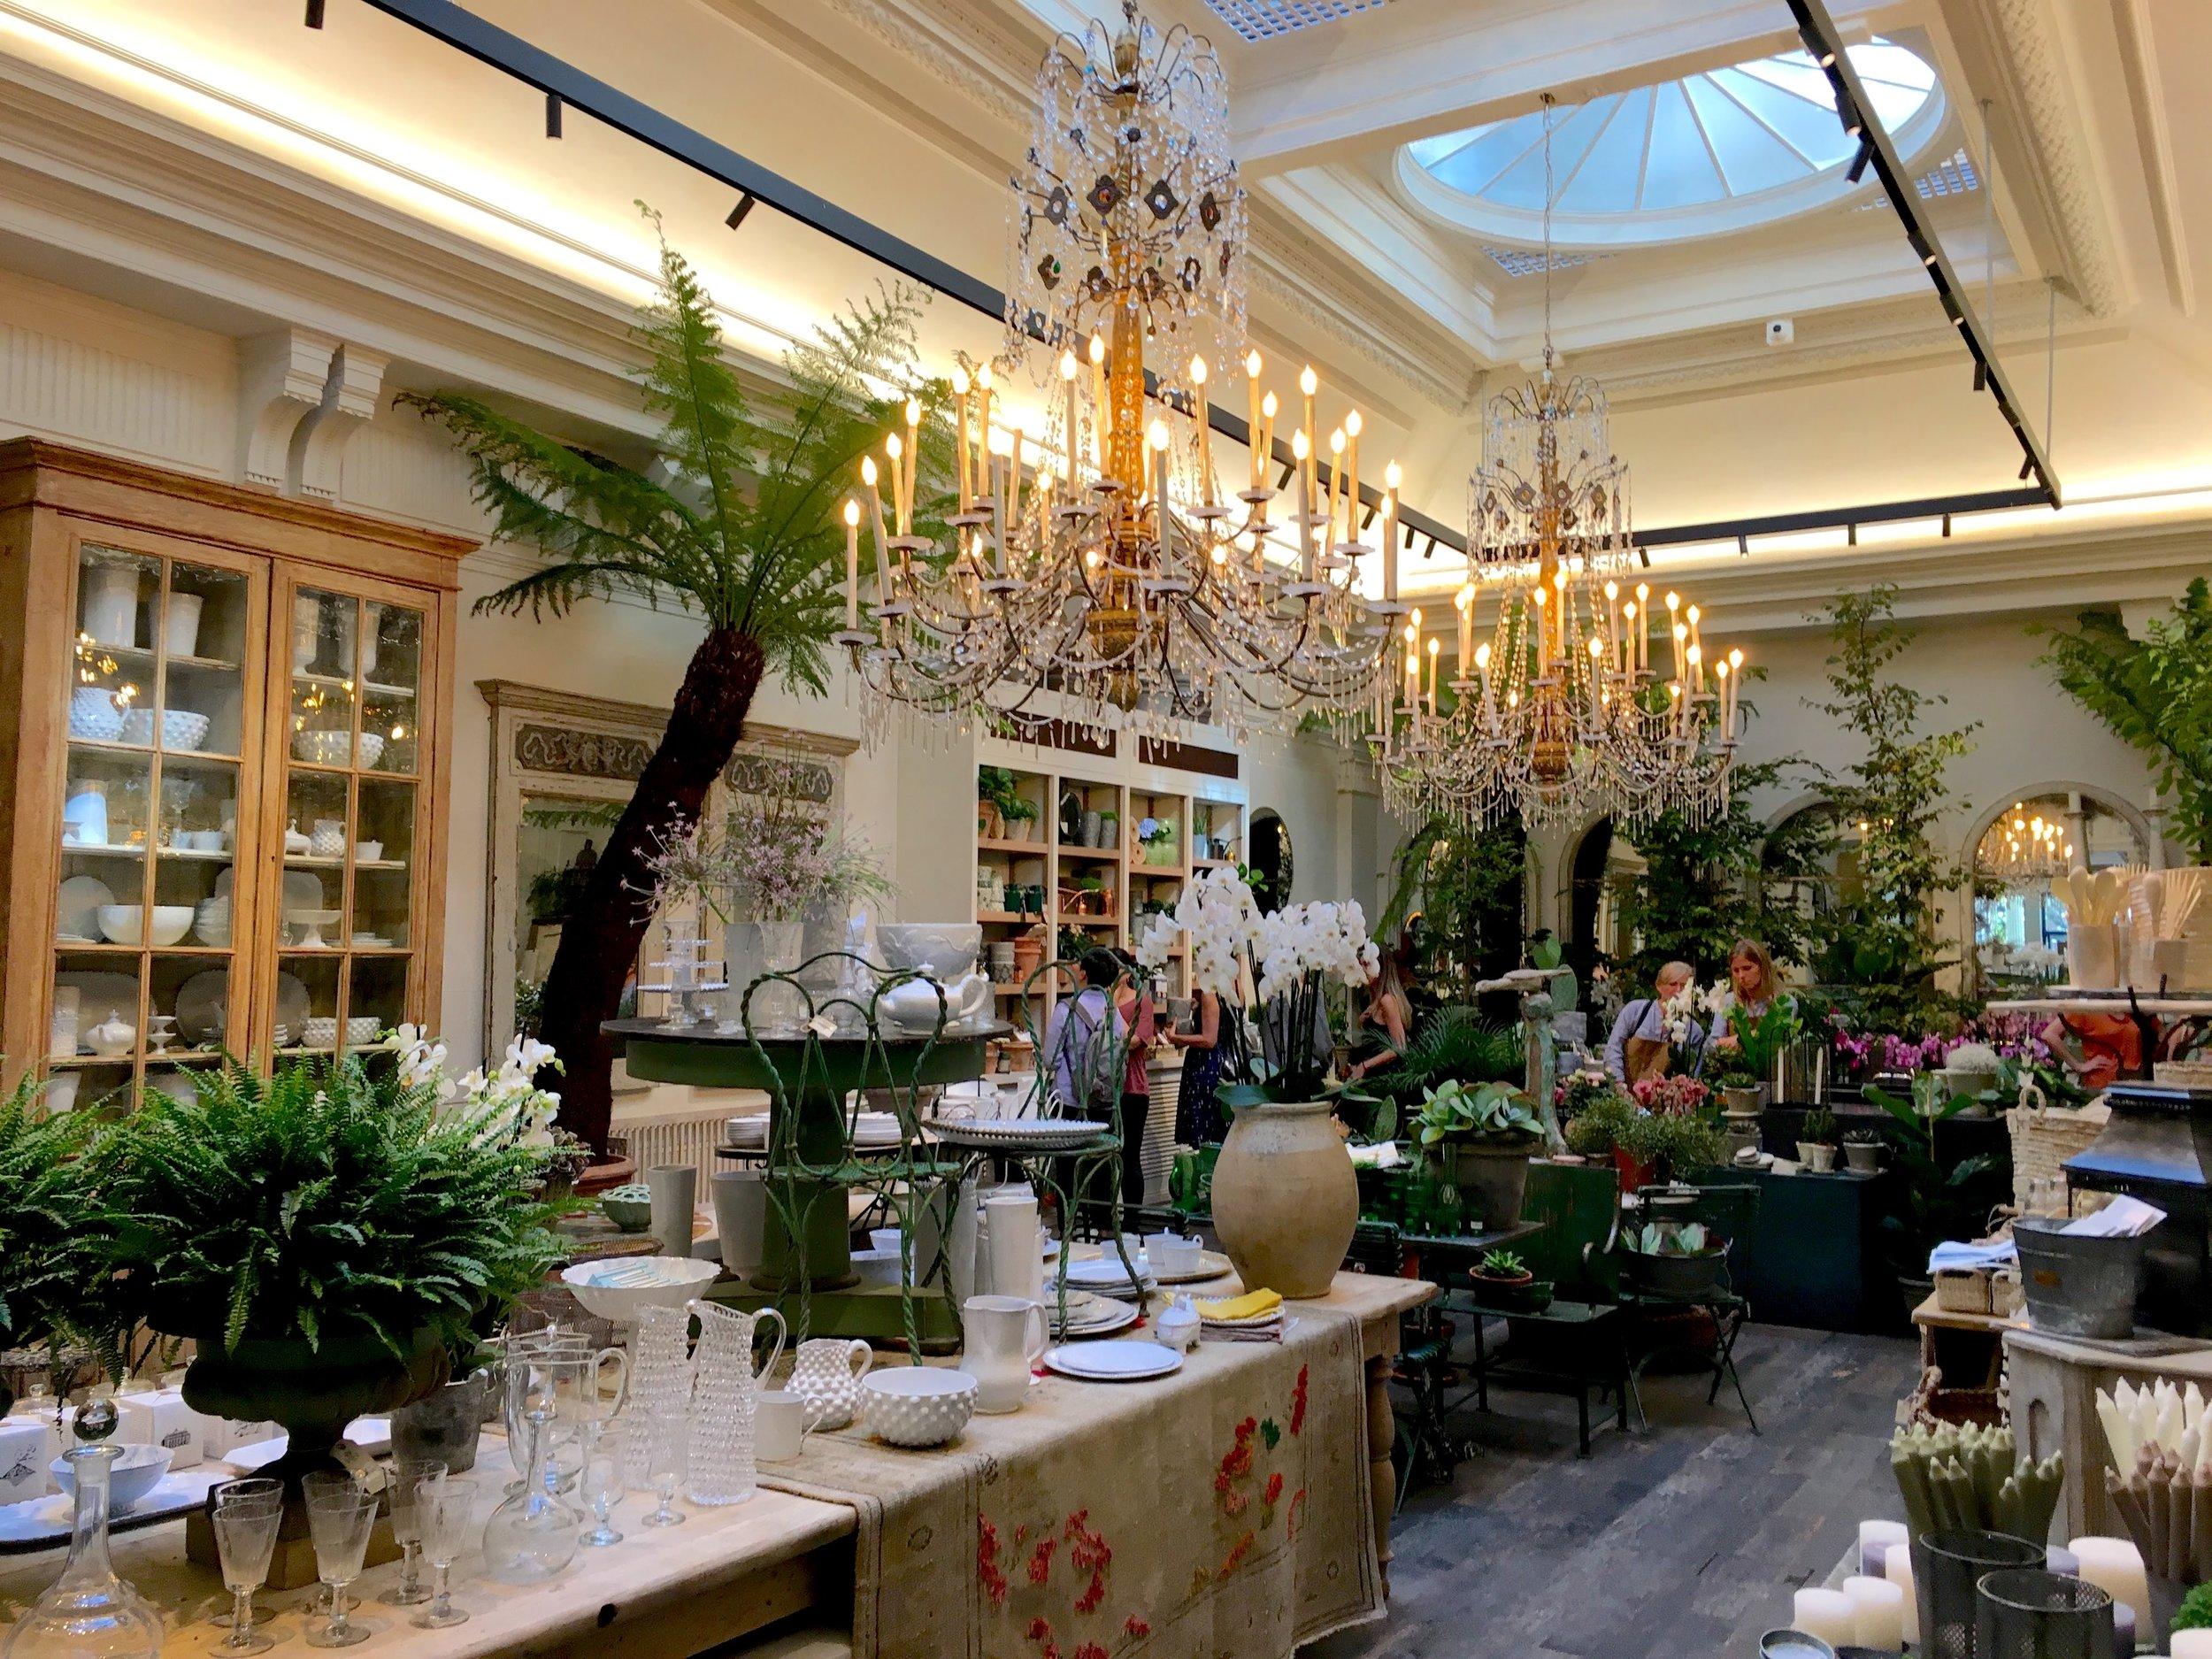 Petersham nursury covent garden interior 6 eileen hsieh followthatbug follow that bug london.JPG